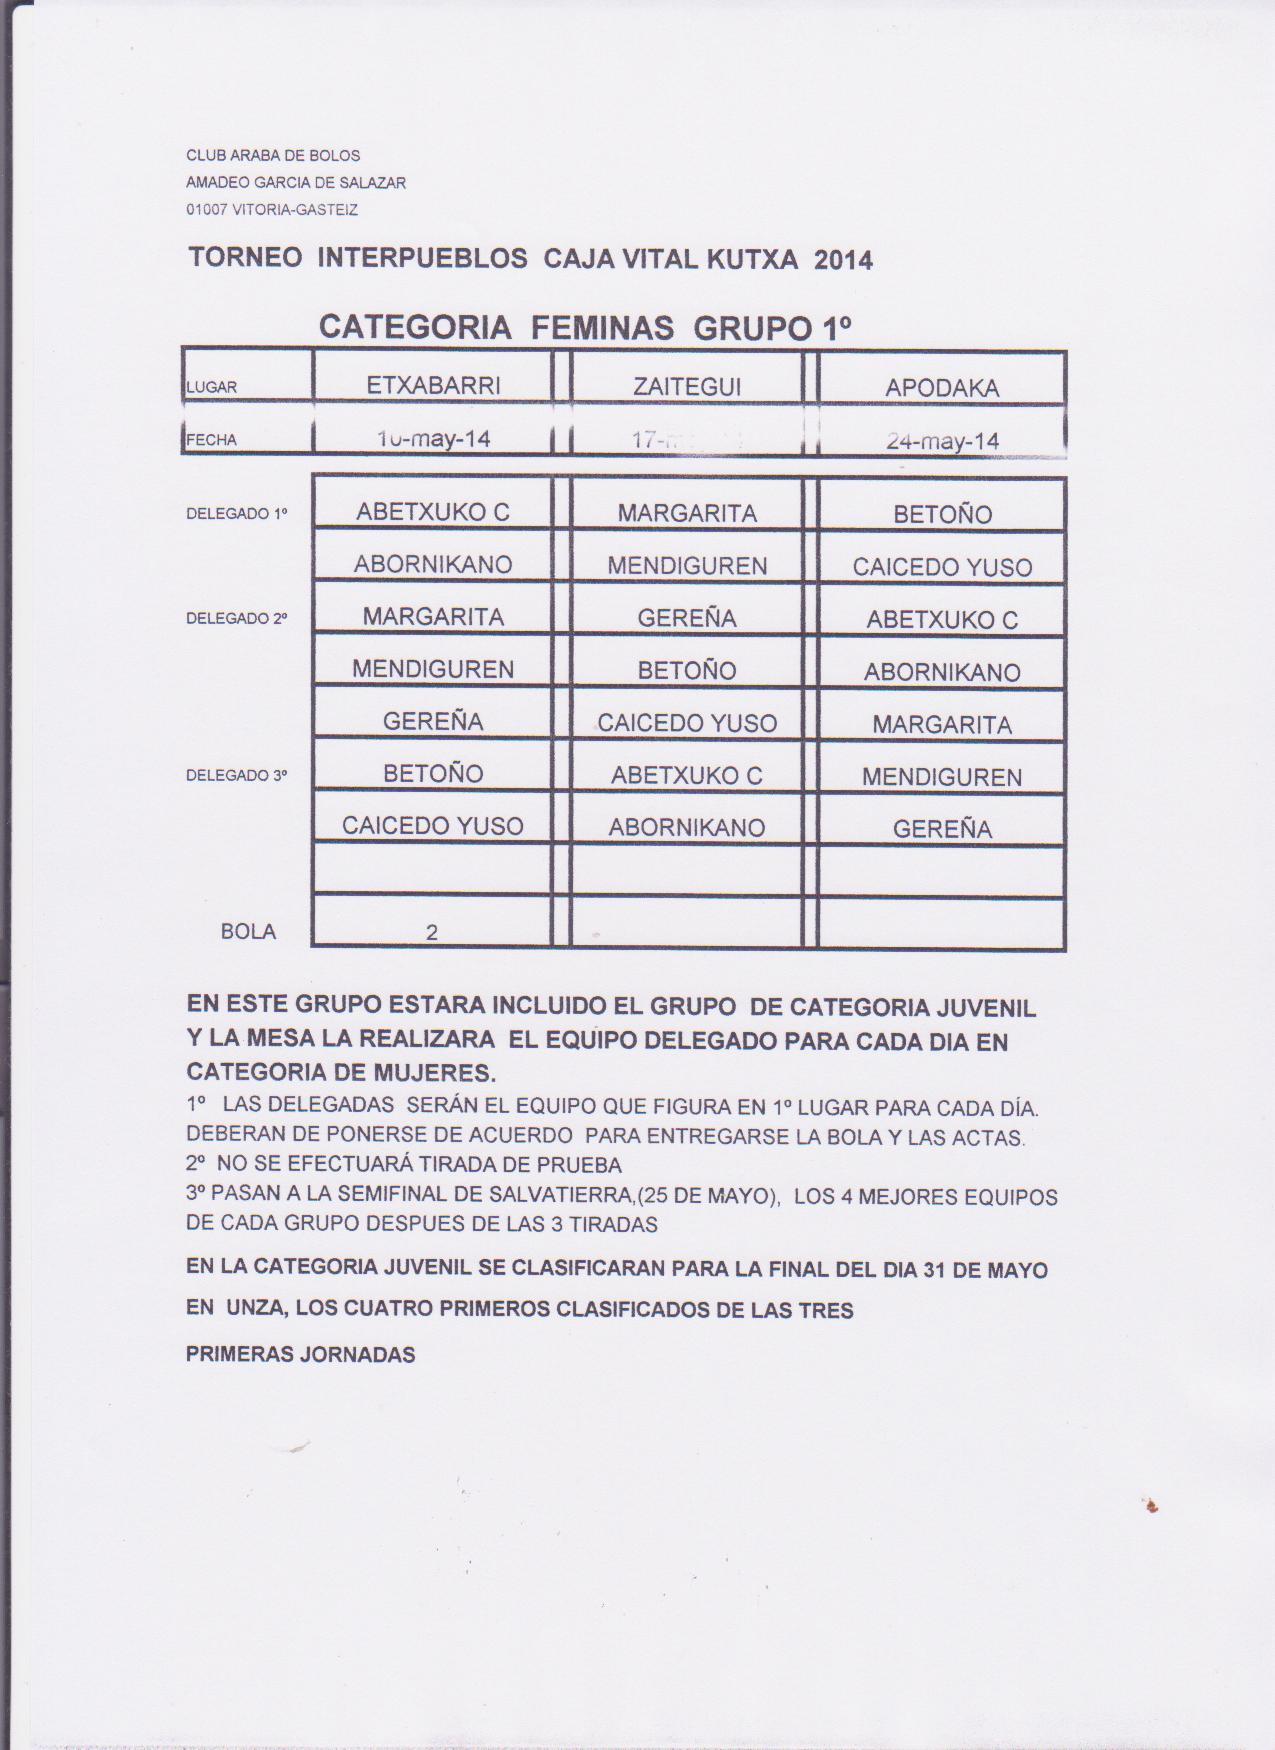 Sorteo interpueblos femenino 2014 3 001